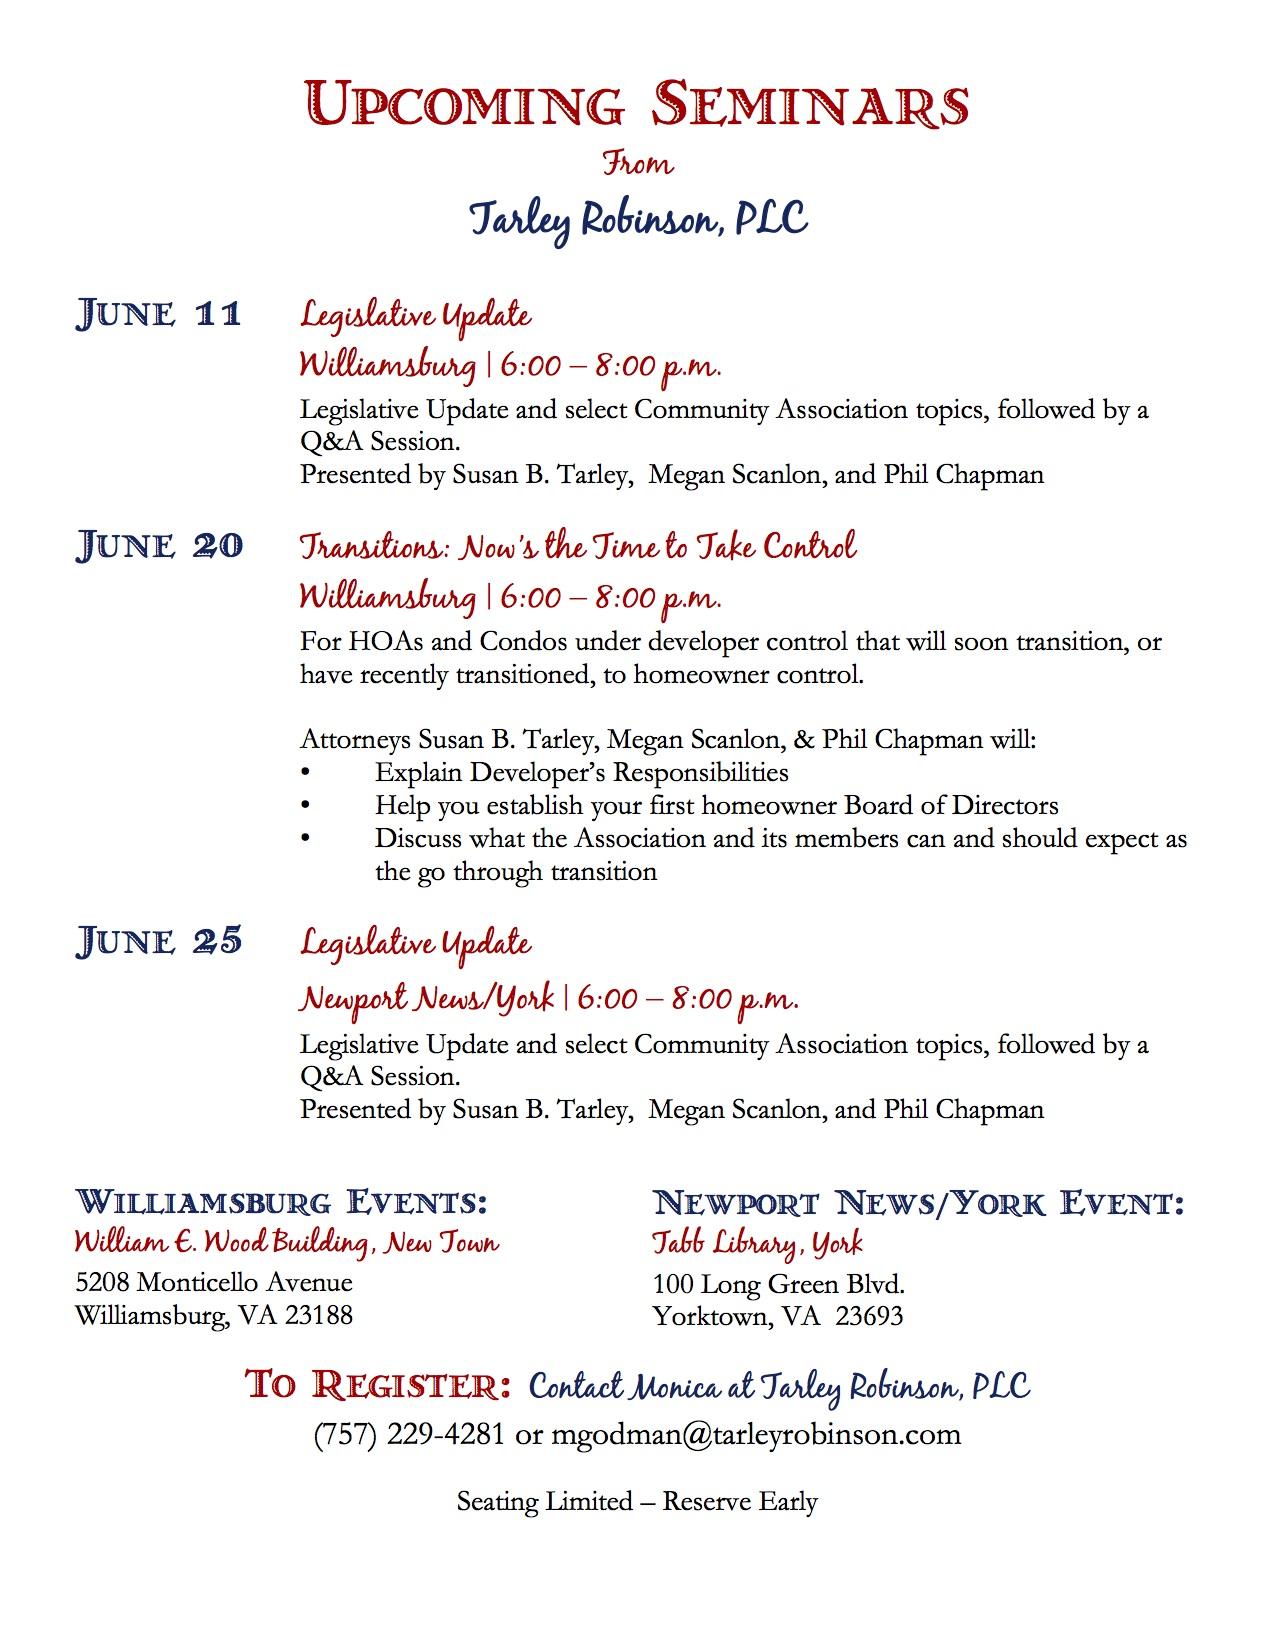 Tarley Robinson June Seminars